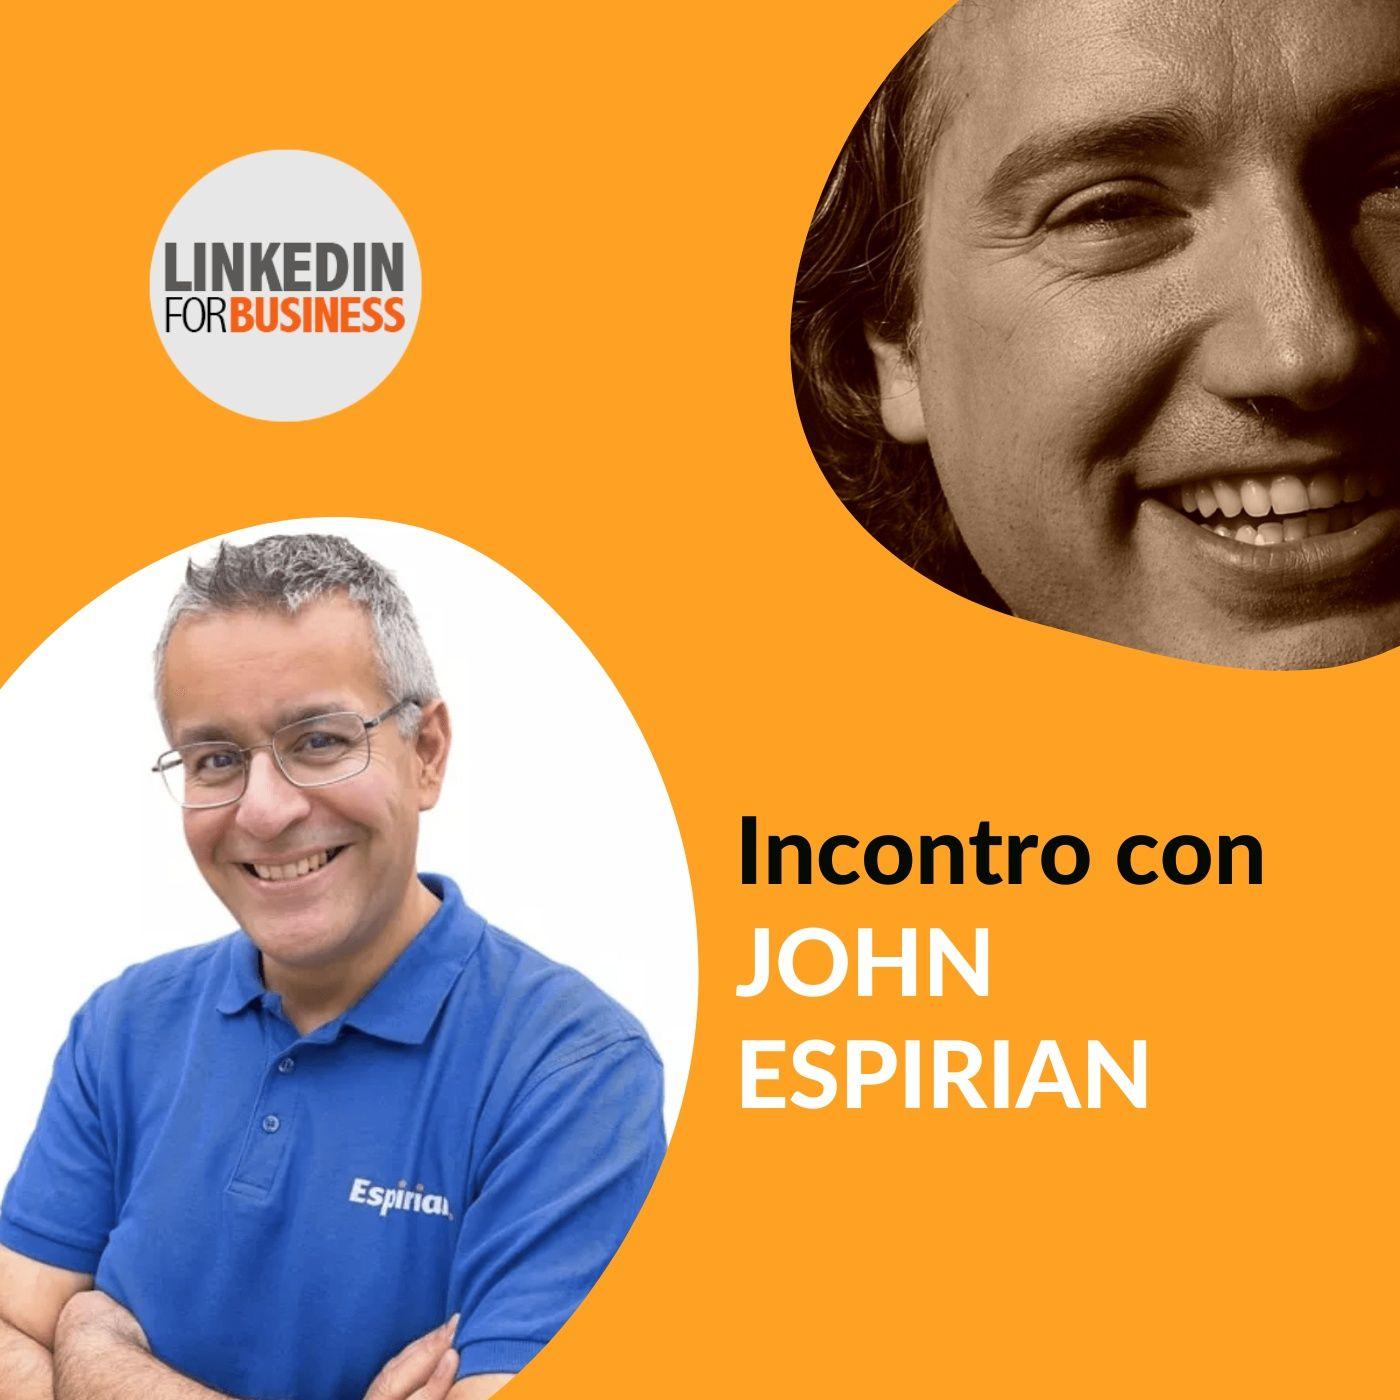 139 - LinkedInForBusiness incontra John Espirian